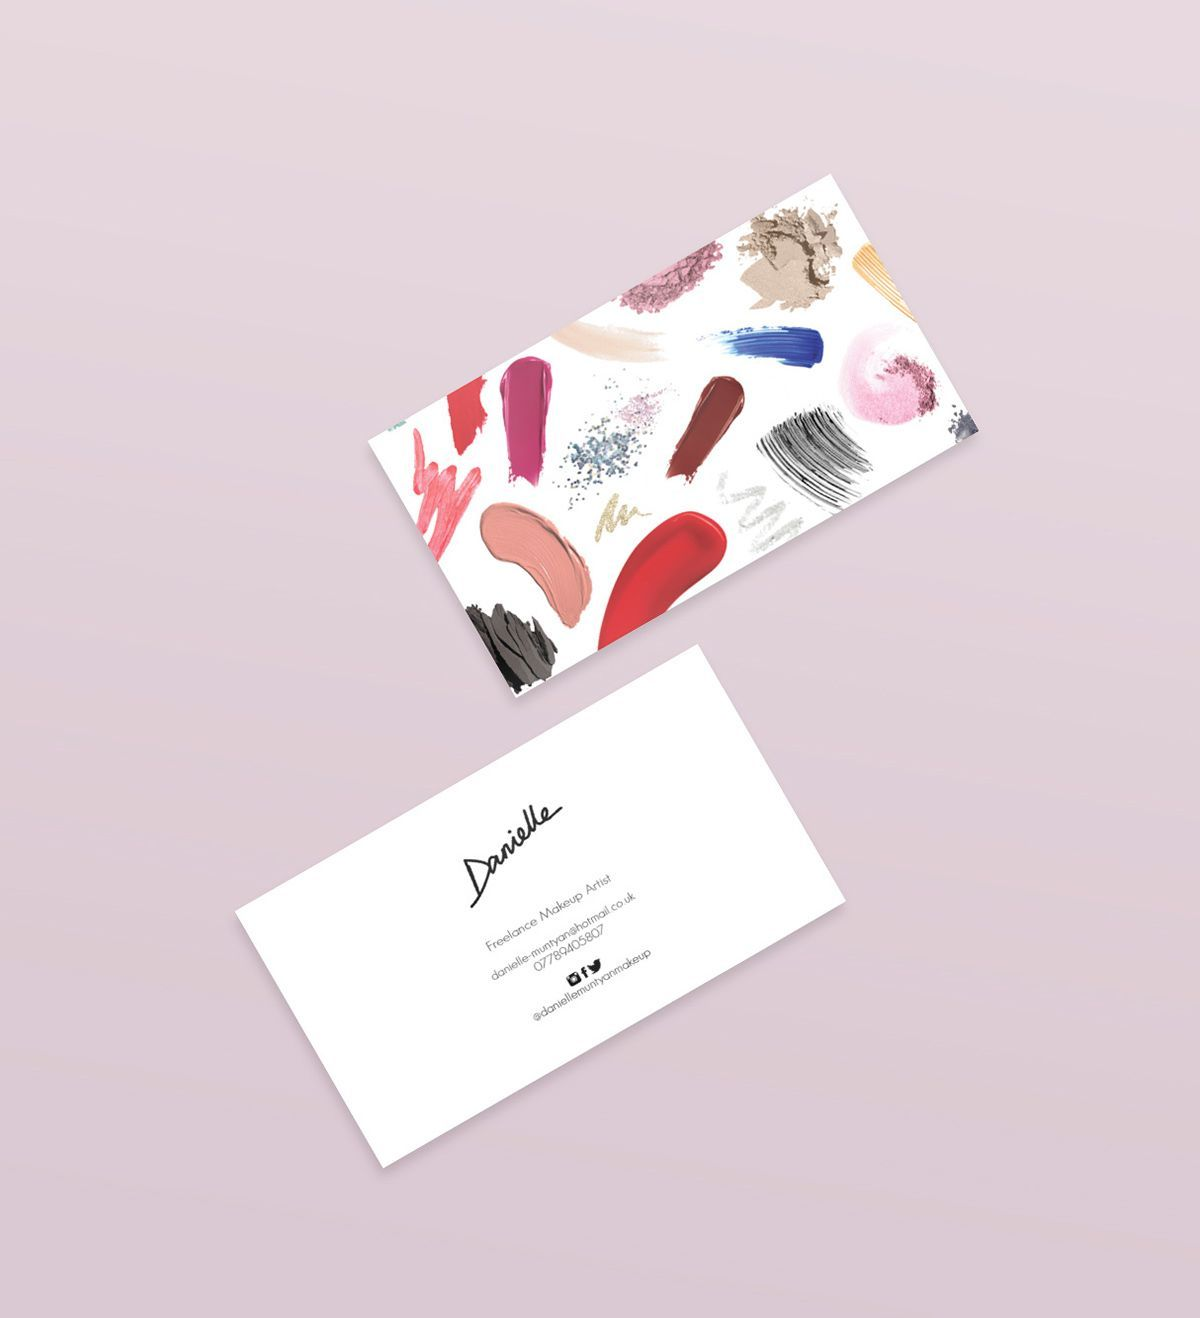 Makeup artist business cards on behance business analyst makeup artist business cards on behance reheart Choice Image